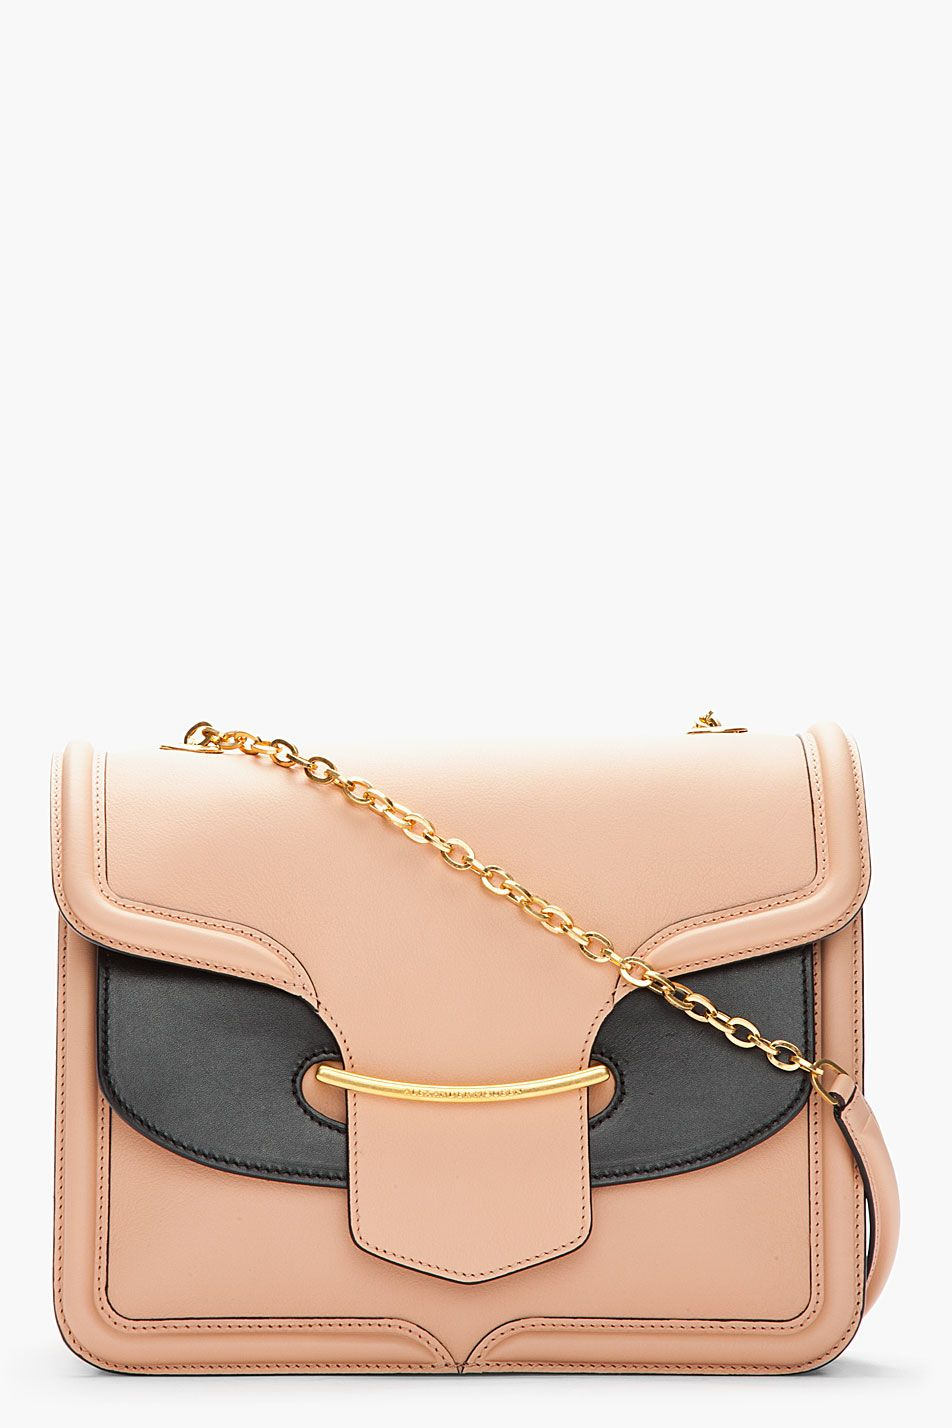 Alexander Mcqueen Blush And Black Leather Heroine Chain_strap Bag  $2,734.45